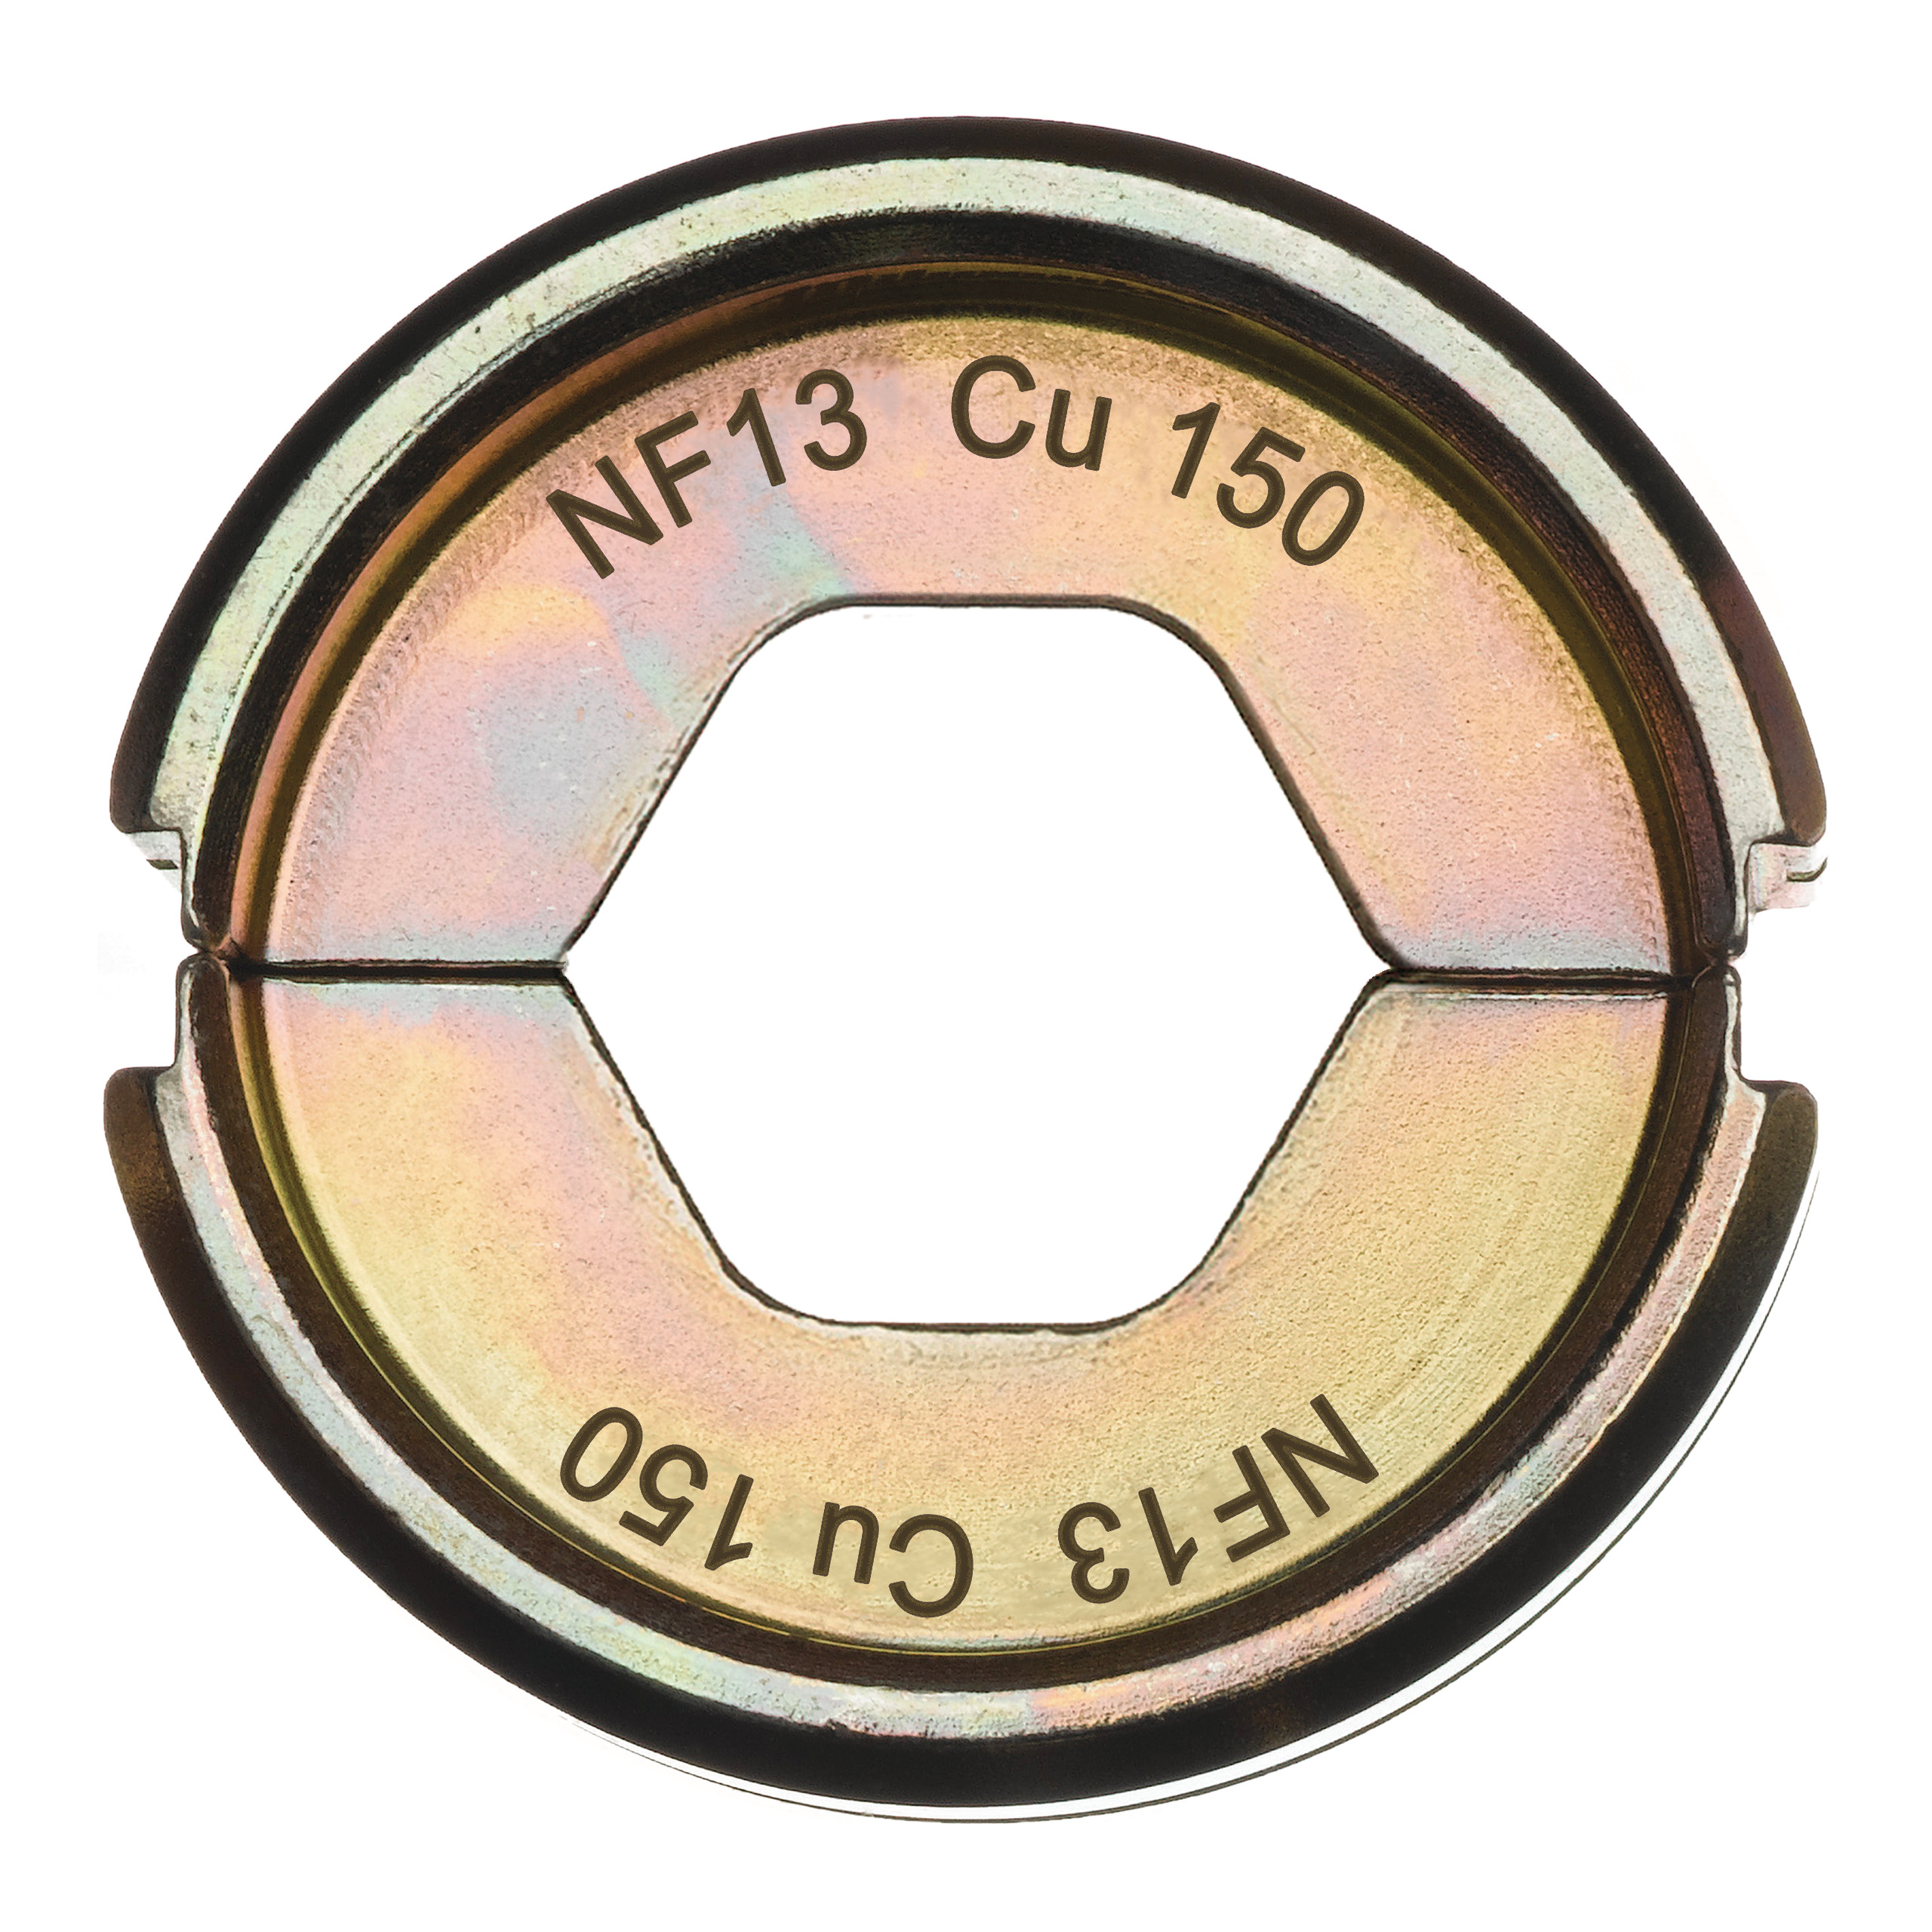 NF13 CU 150-1PC Pojistný kroužek